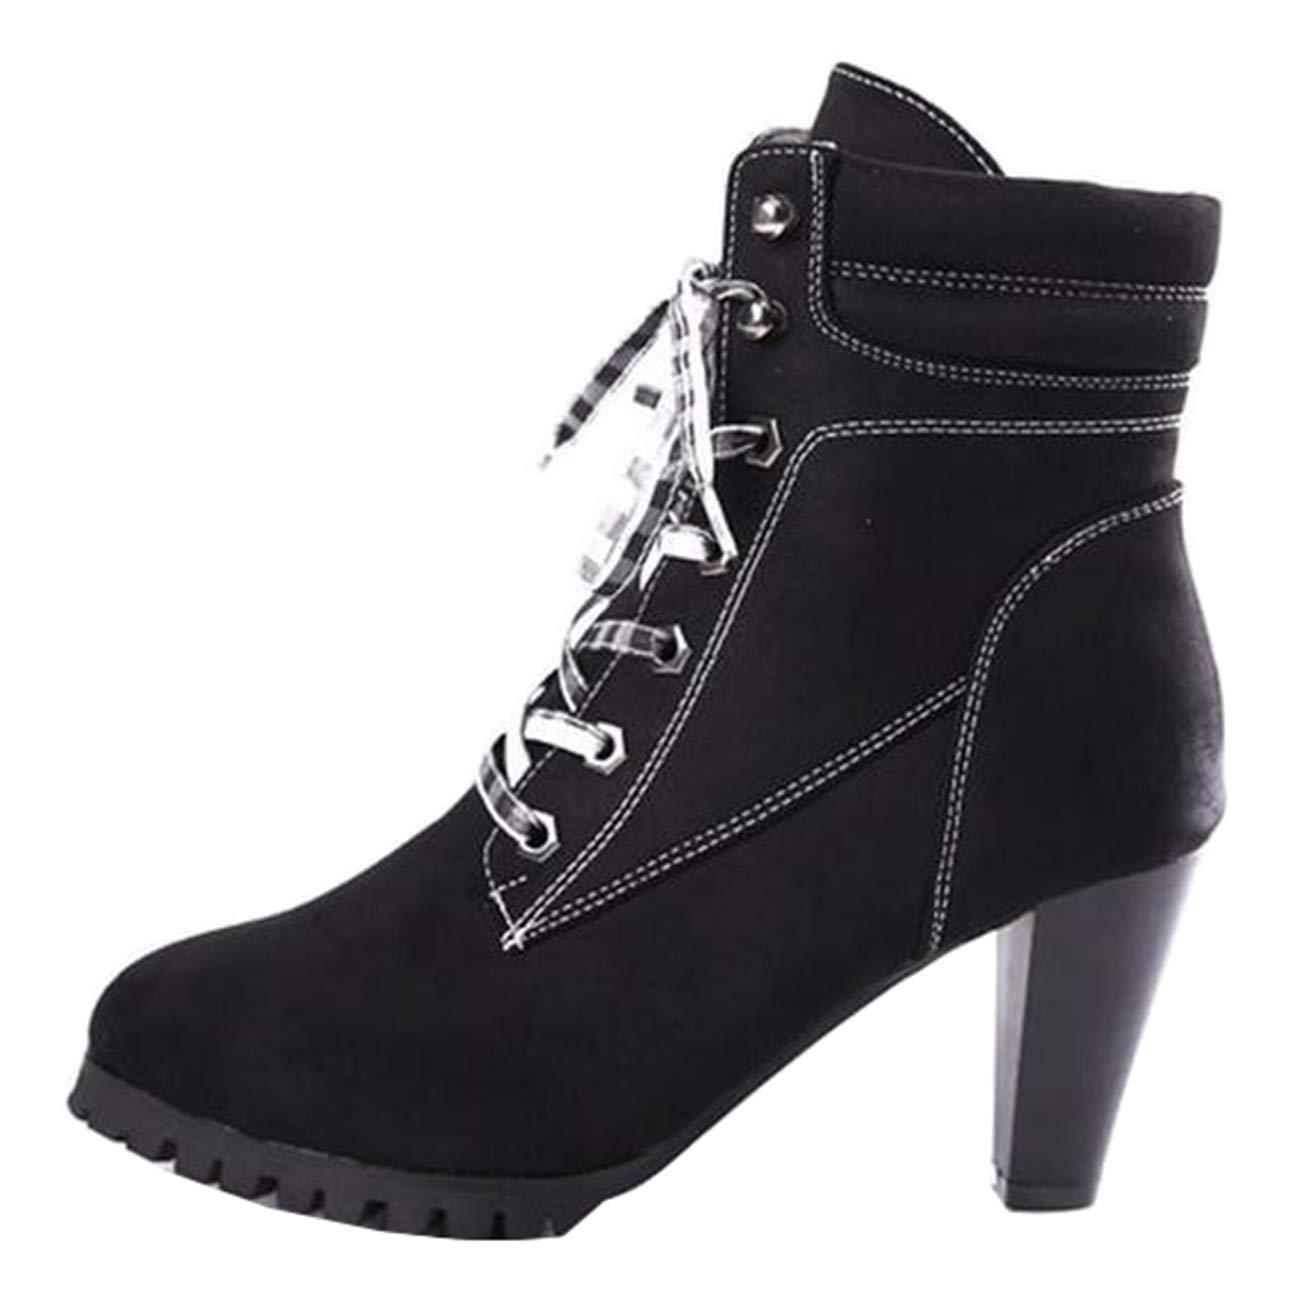 Eeayyygch Damen Runde-Toe-Plattform Kegel-Ferse Schnürstiefeletten (Farbe   Schwarz, Größe   5 UK)